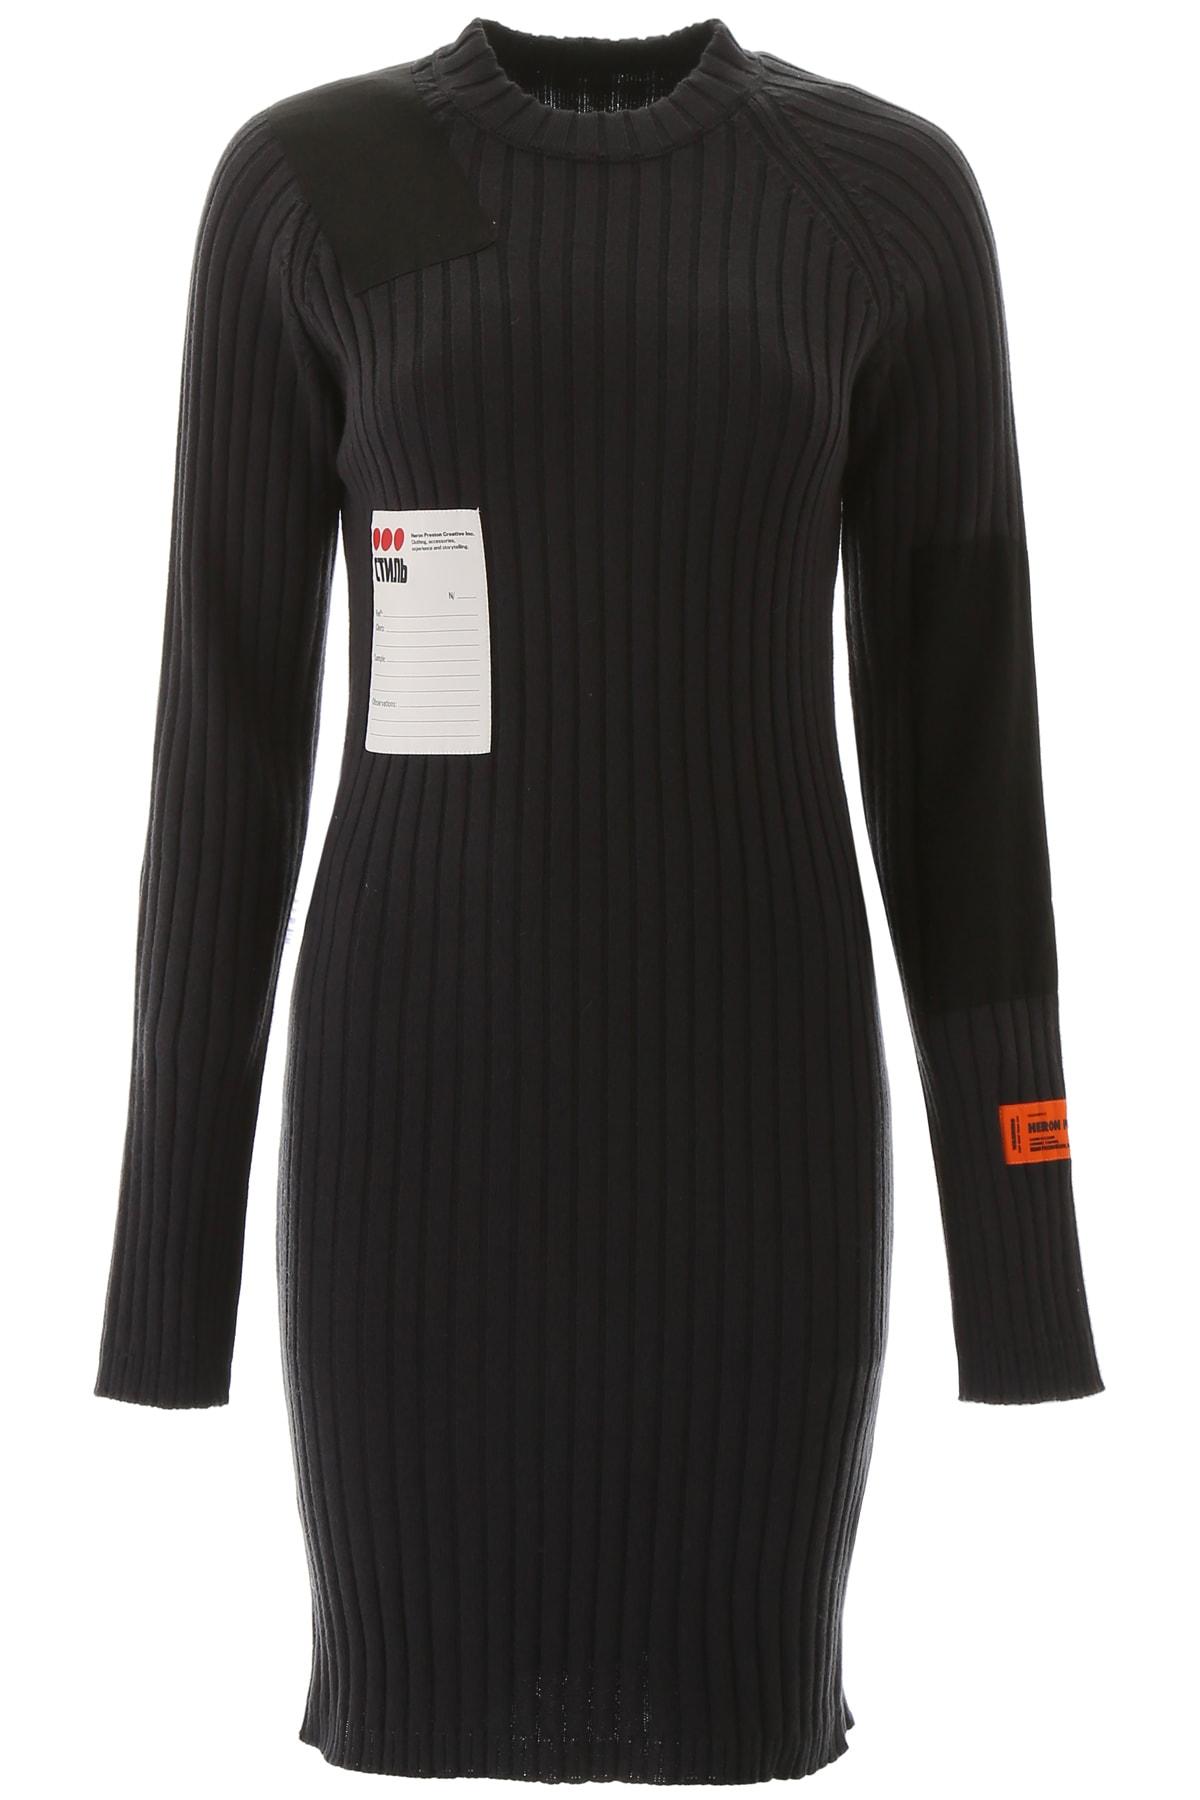 HERON PRESTON Ribbed Knit Dress